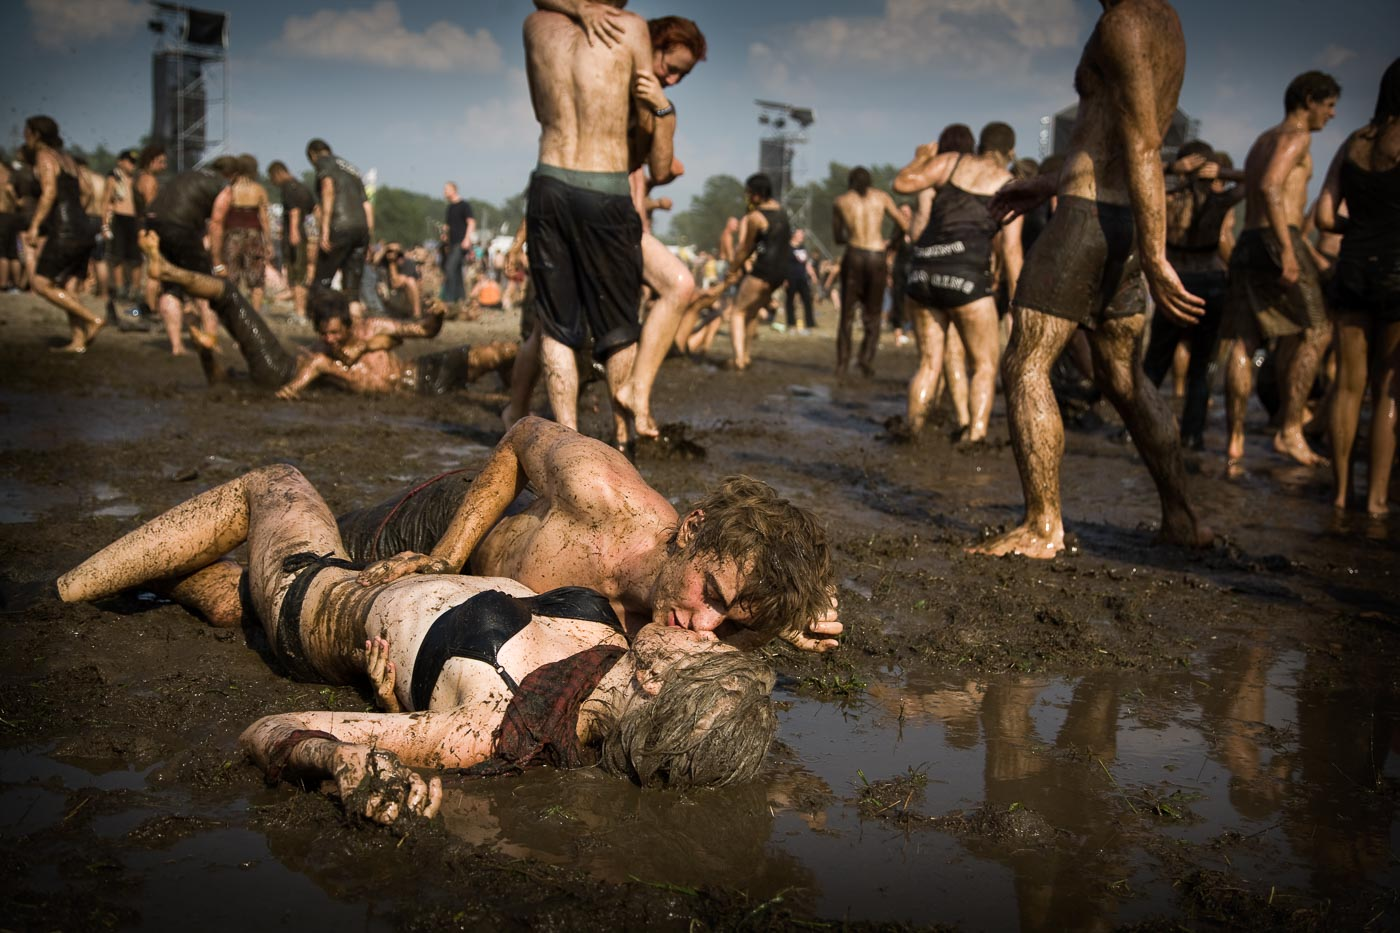 Woodstock Tube Search 31 videos - NudeVista